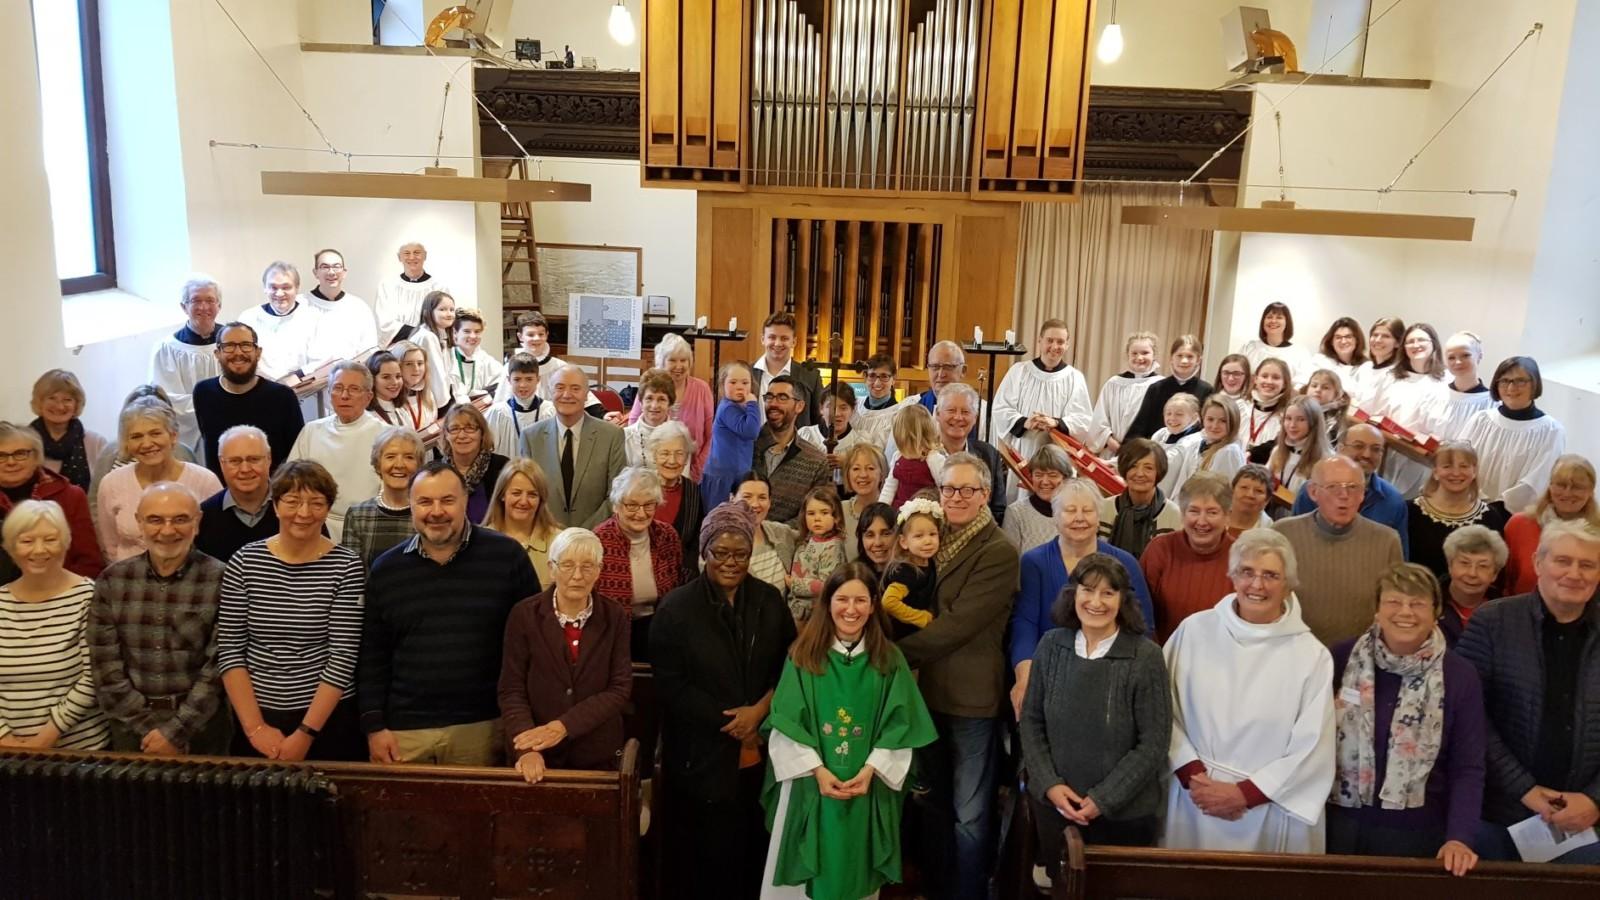 St Thomas' Congregation